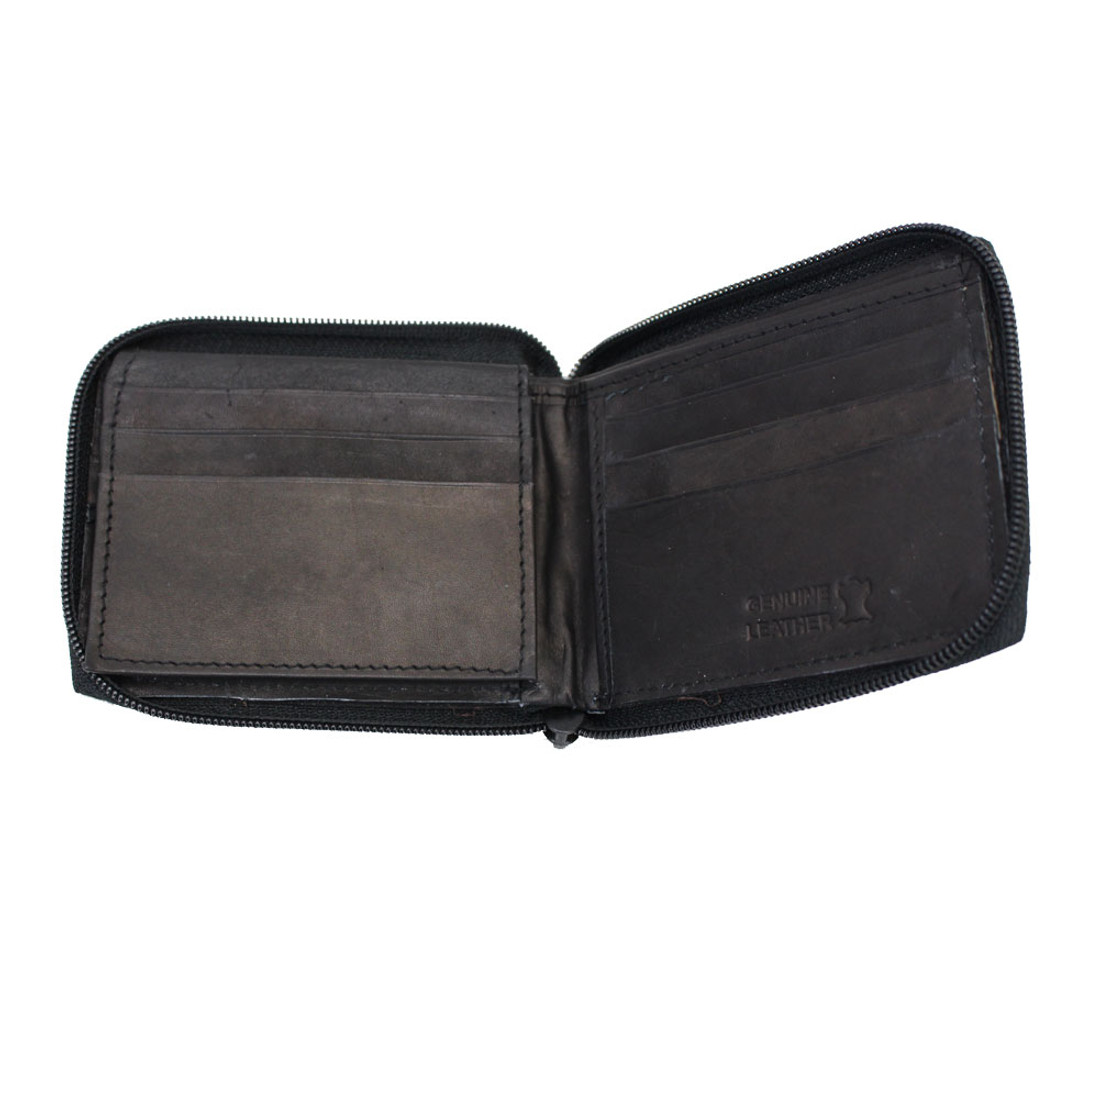 Unisex  Bi-Fold Zip Around Genuine Black Leather Wallet Plain Simple